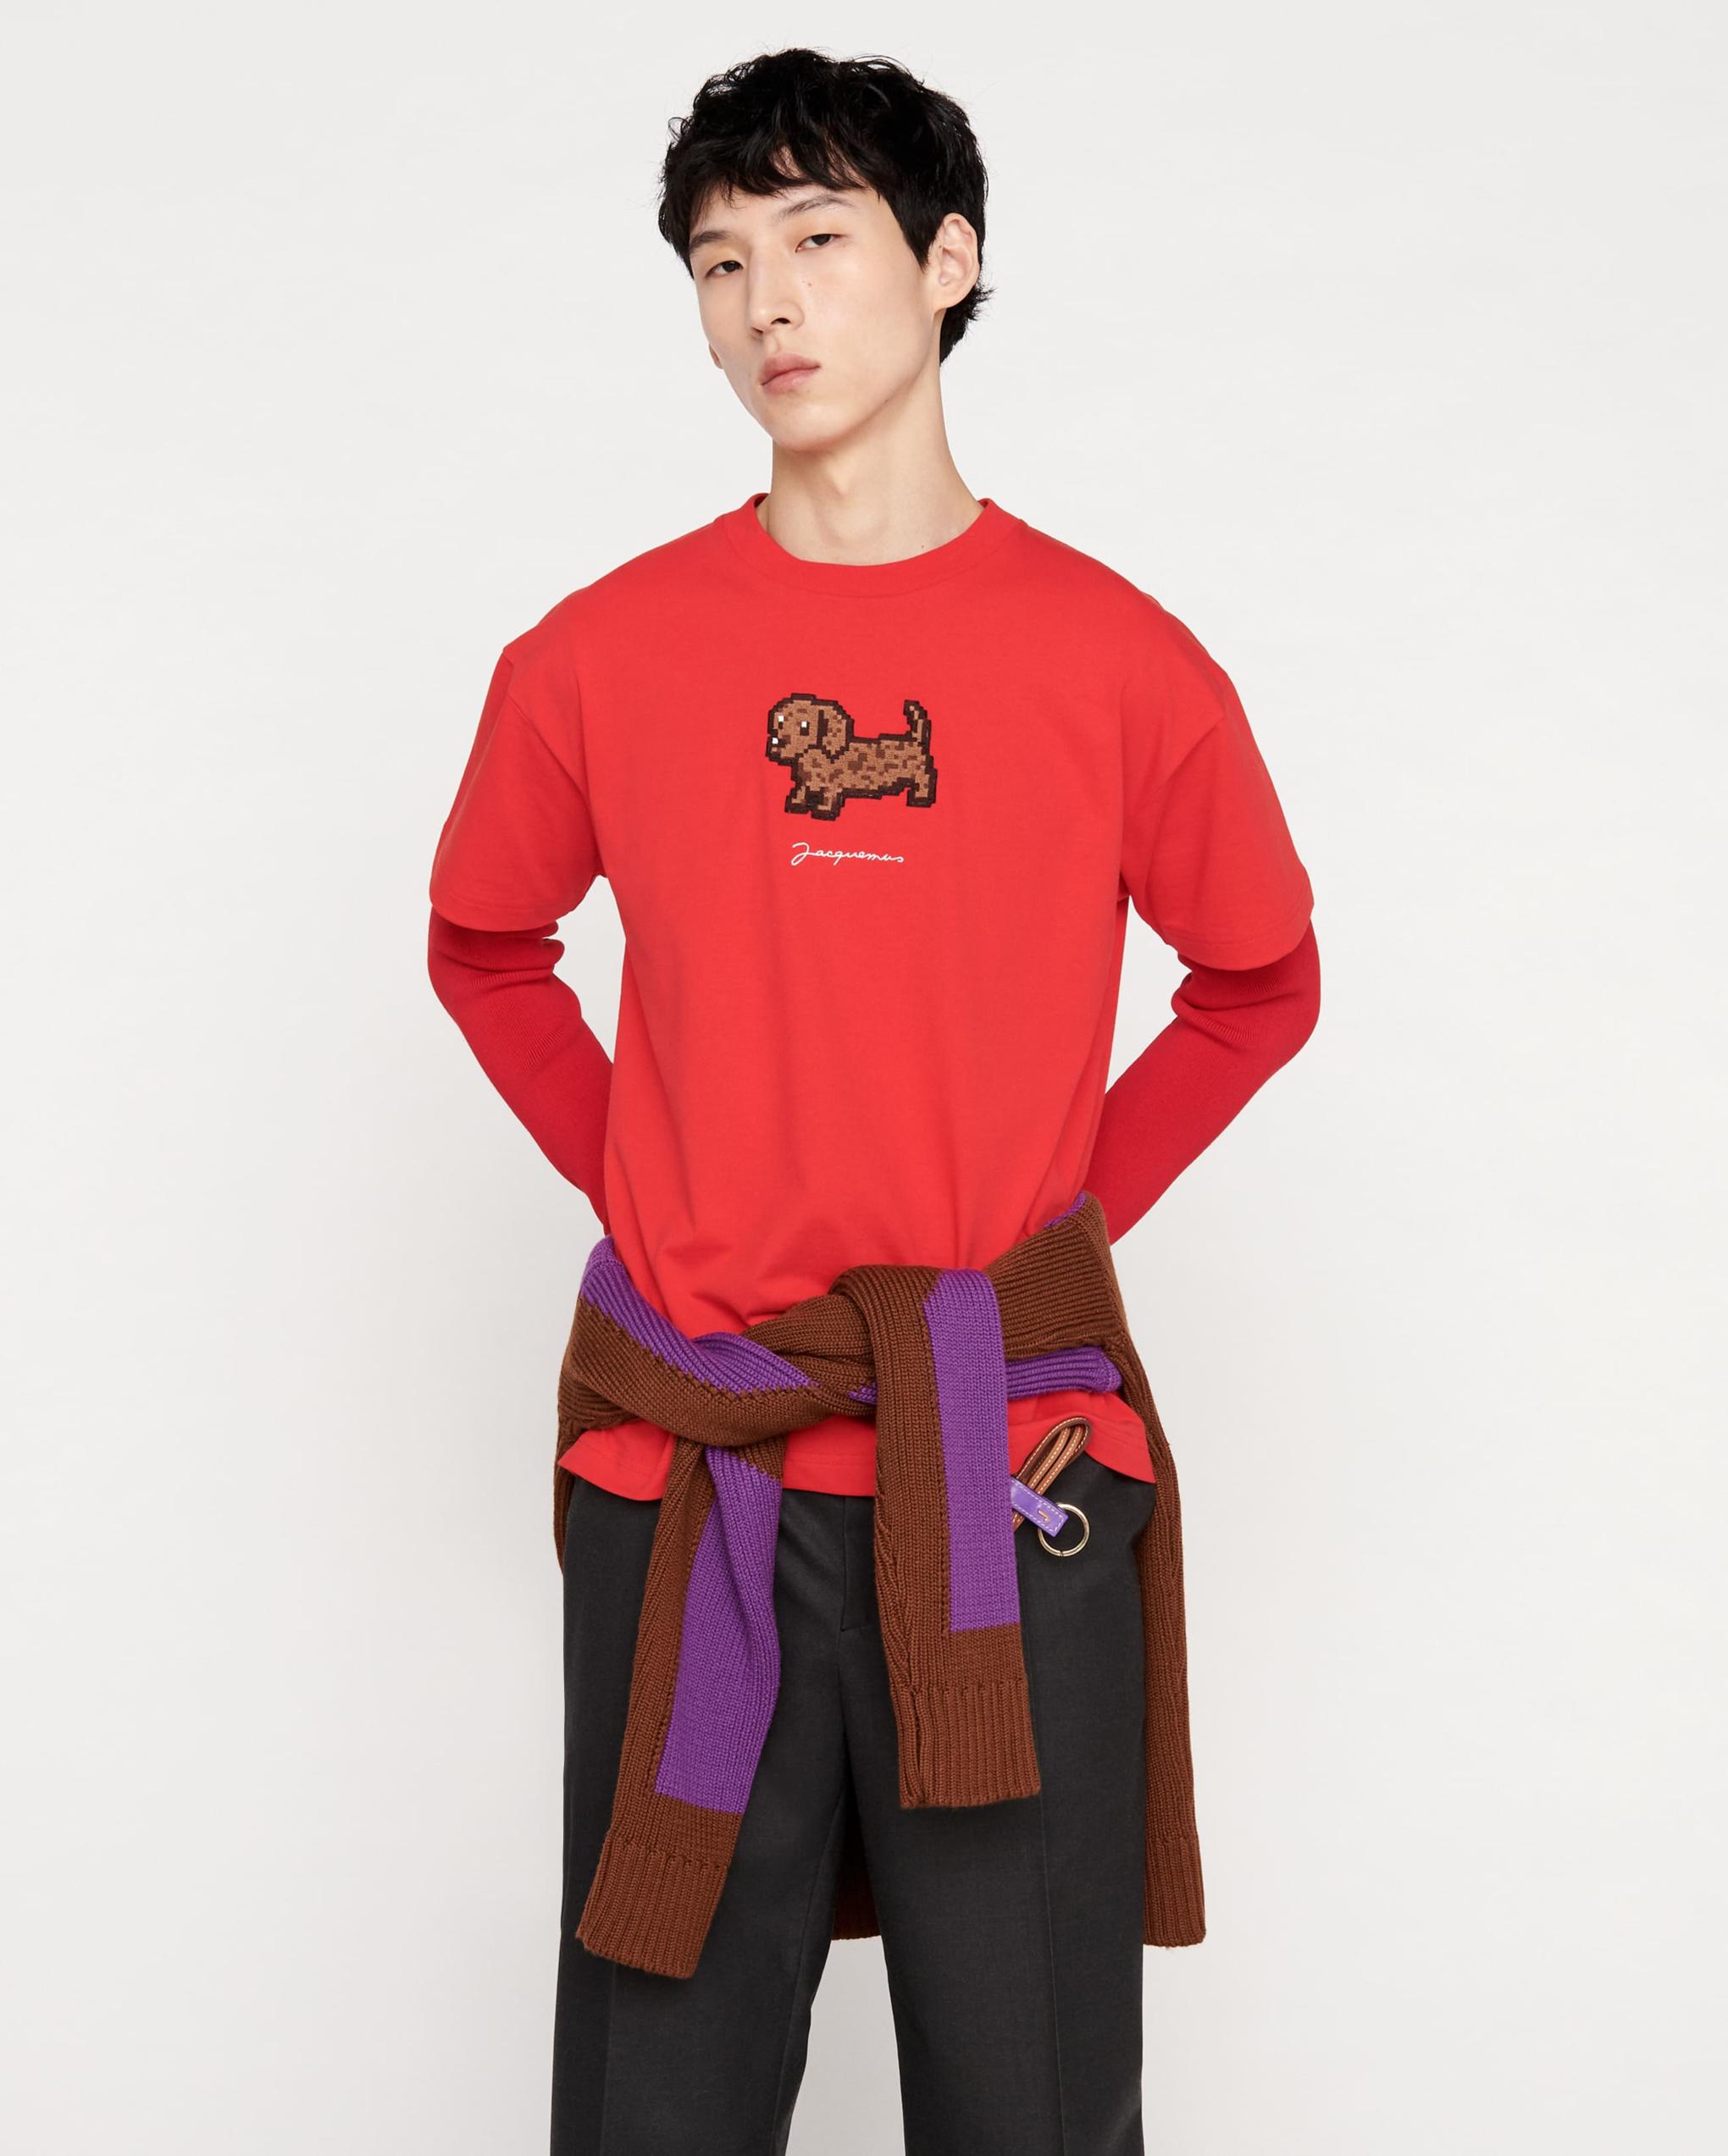 Le t-shirt Pistoun